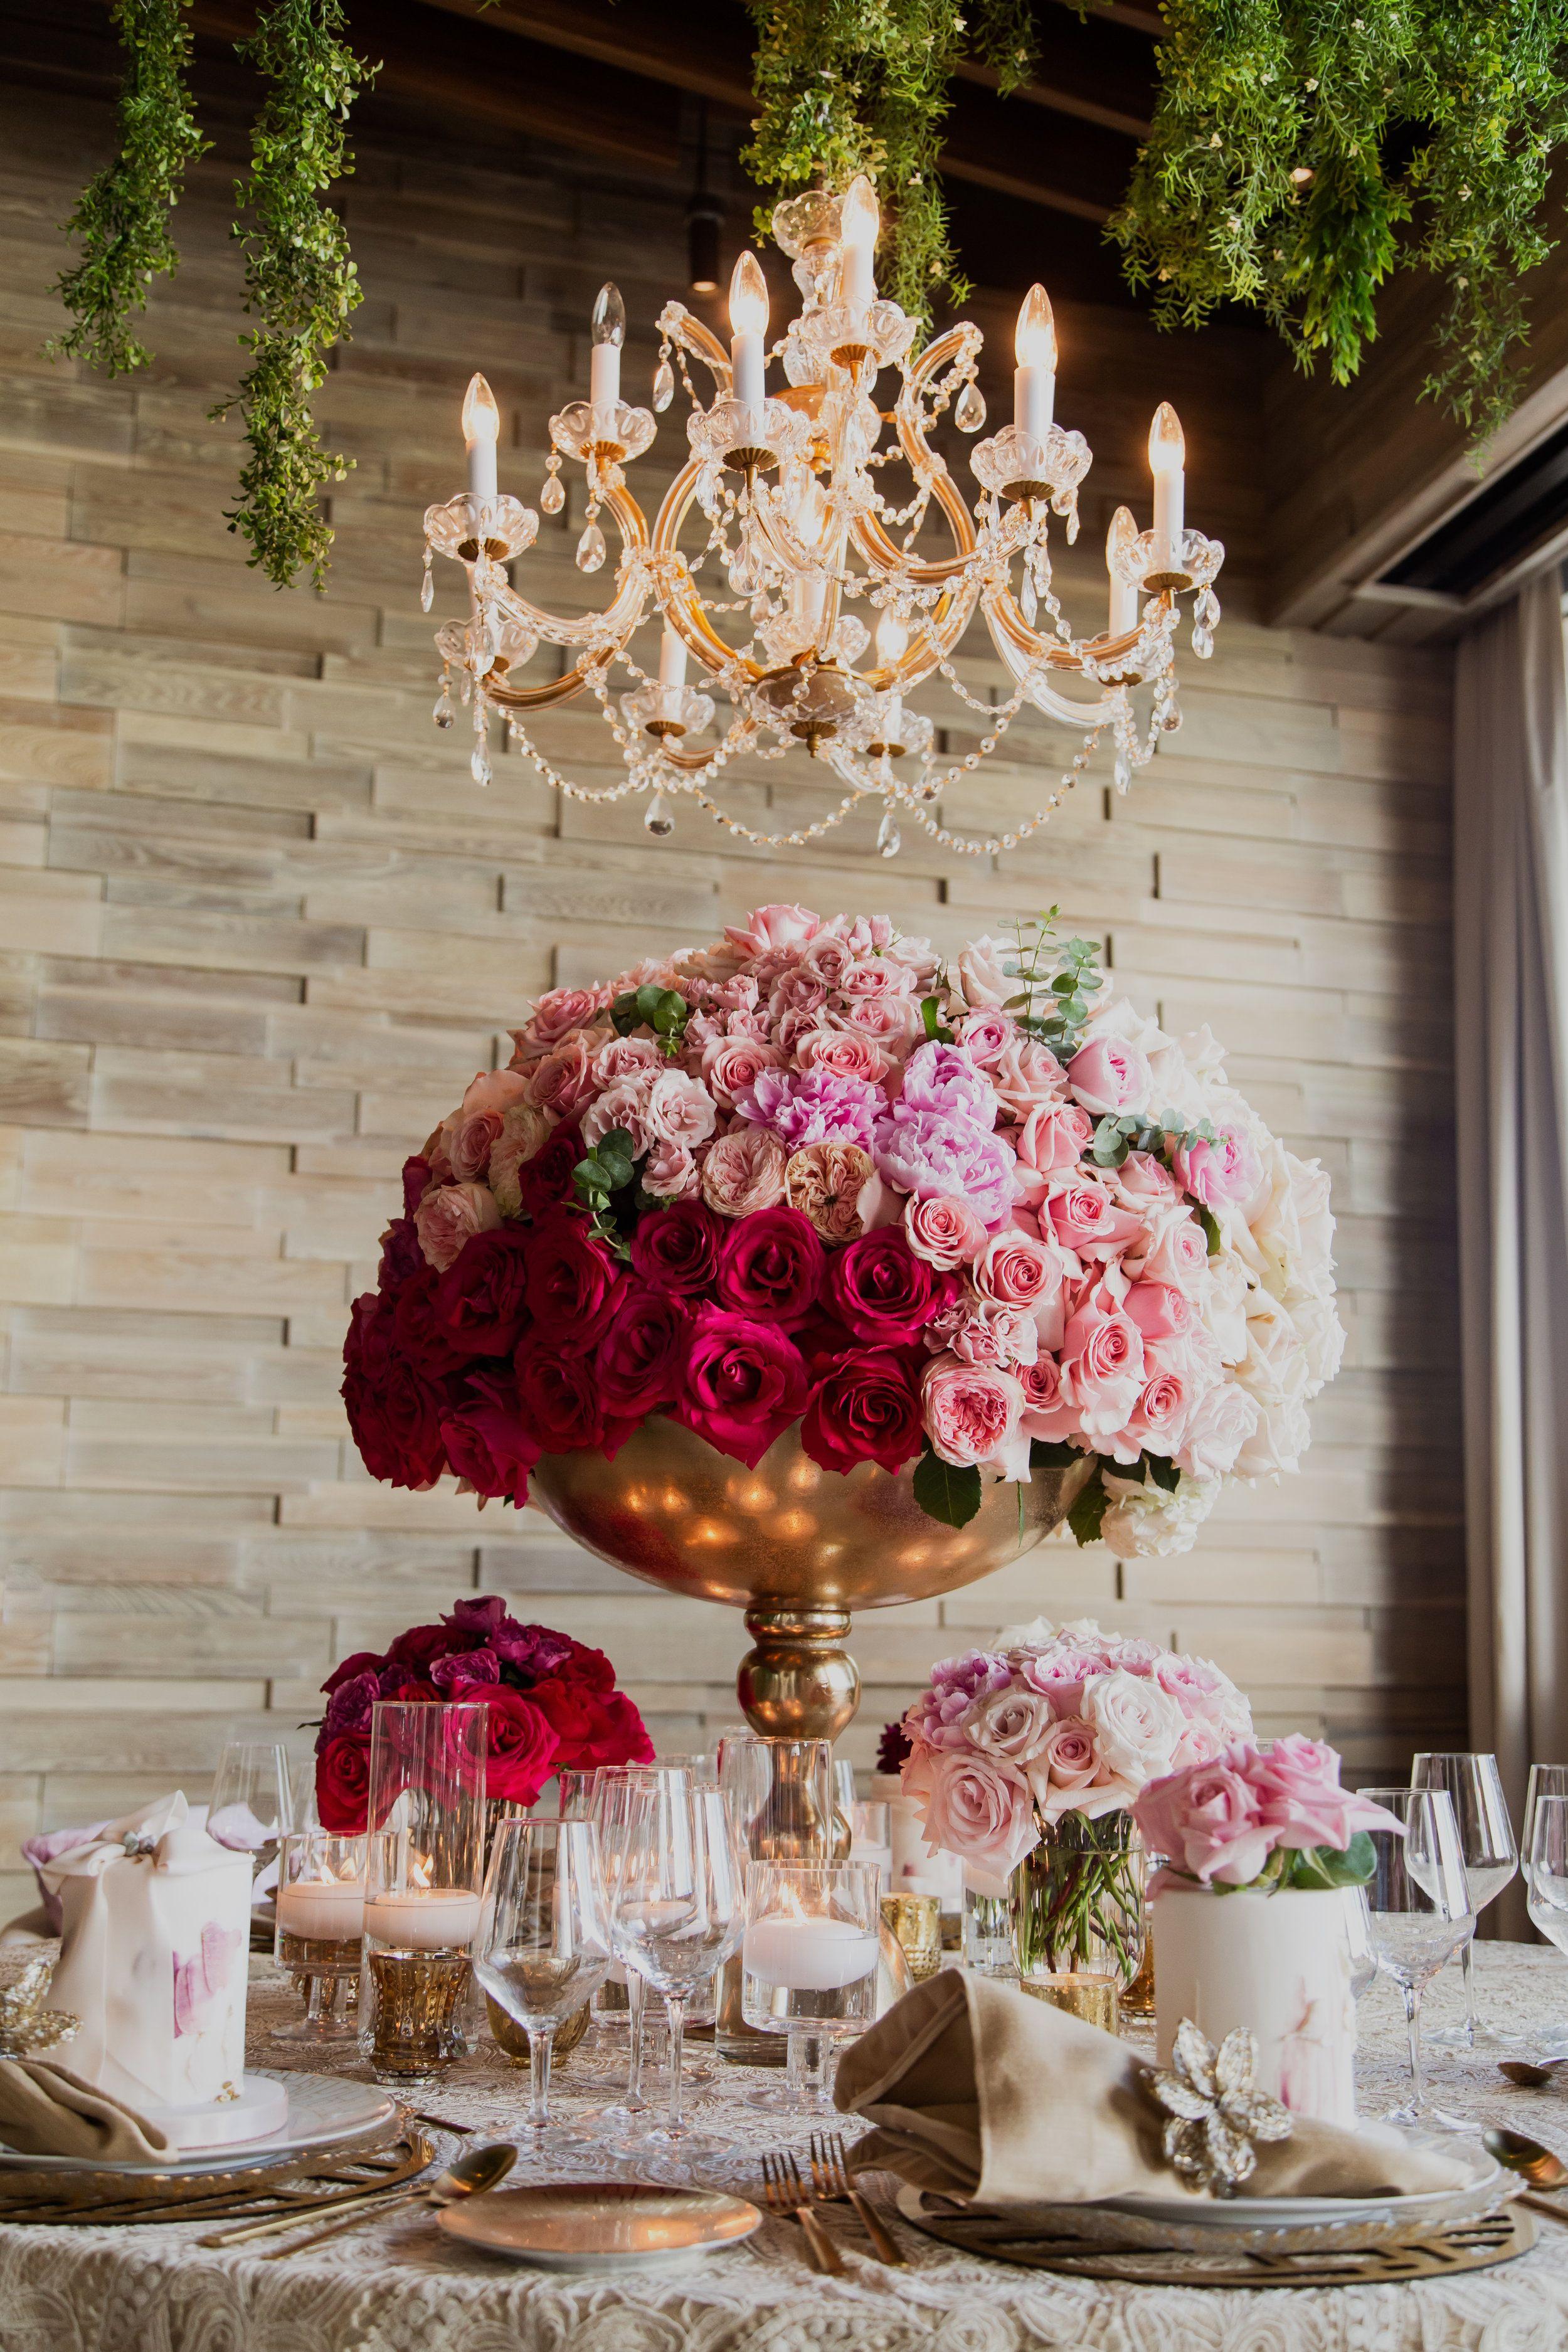 Wedding decorations reception ideas october 2018 Styled Shoot in   EVENT IDEAS  Pinterest  Wedding